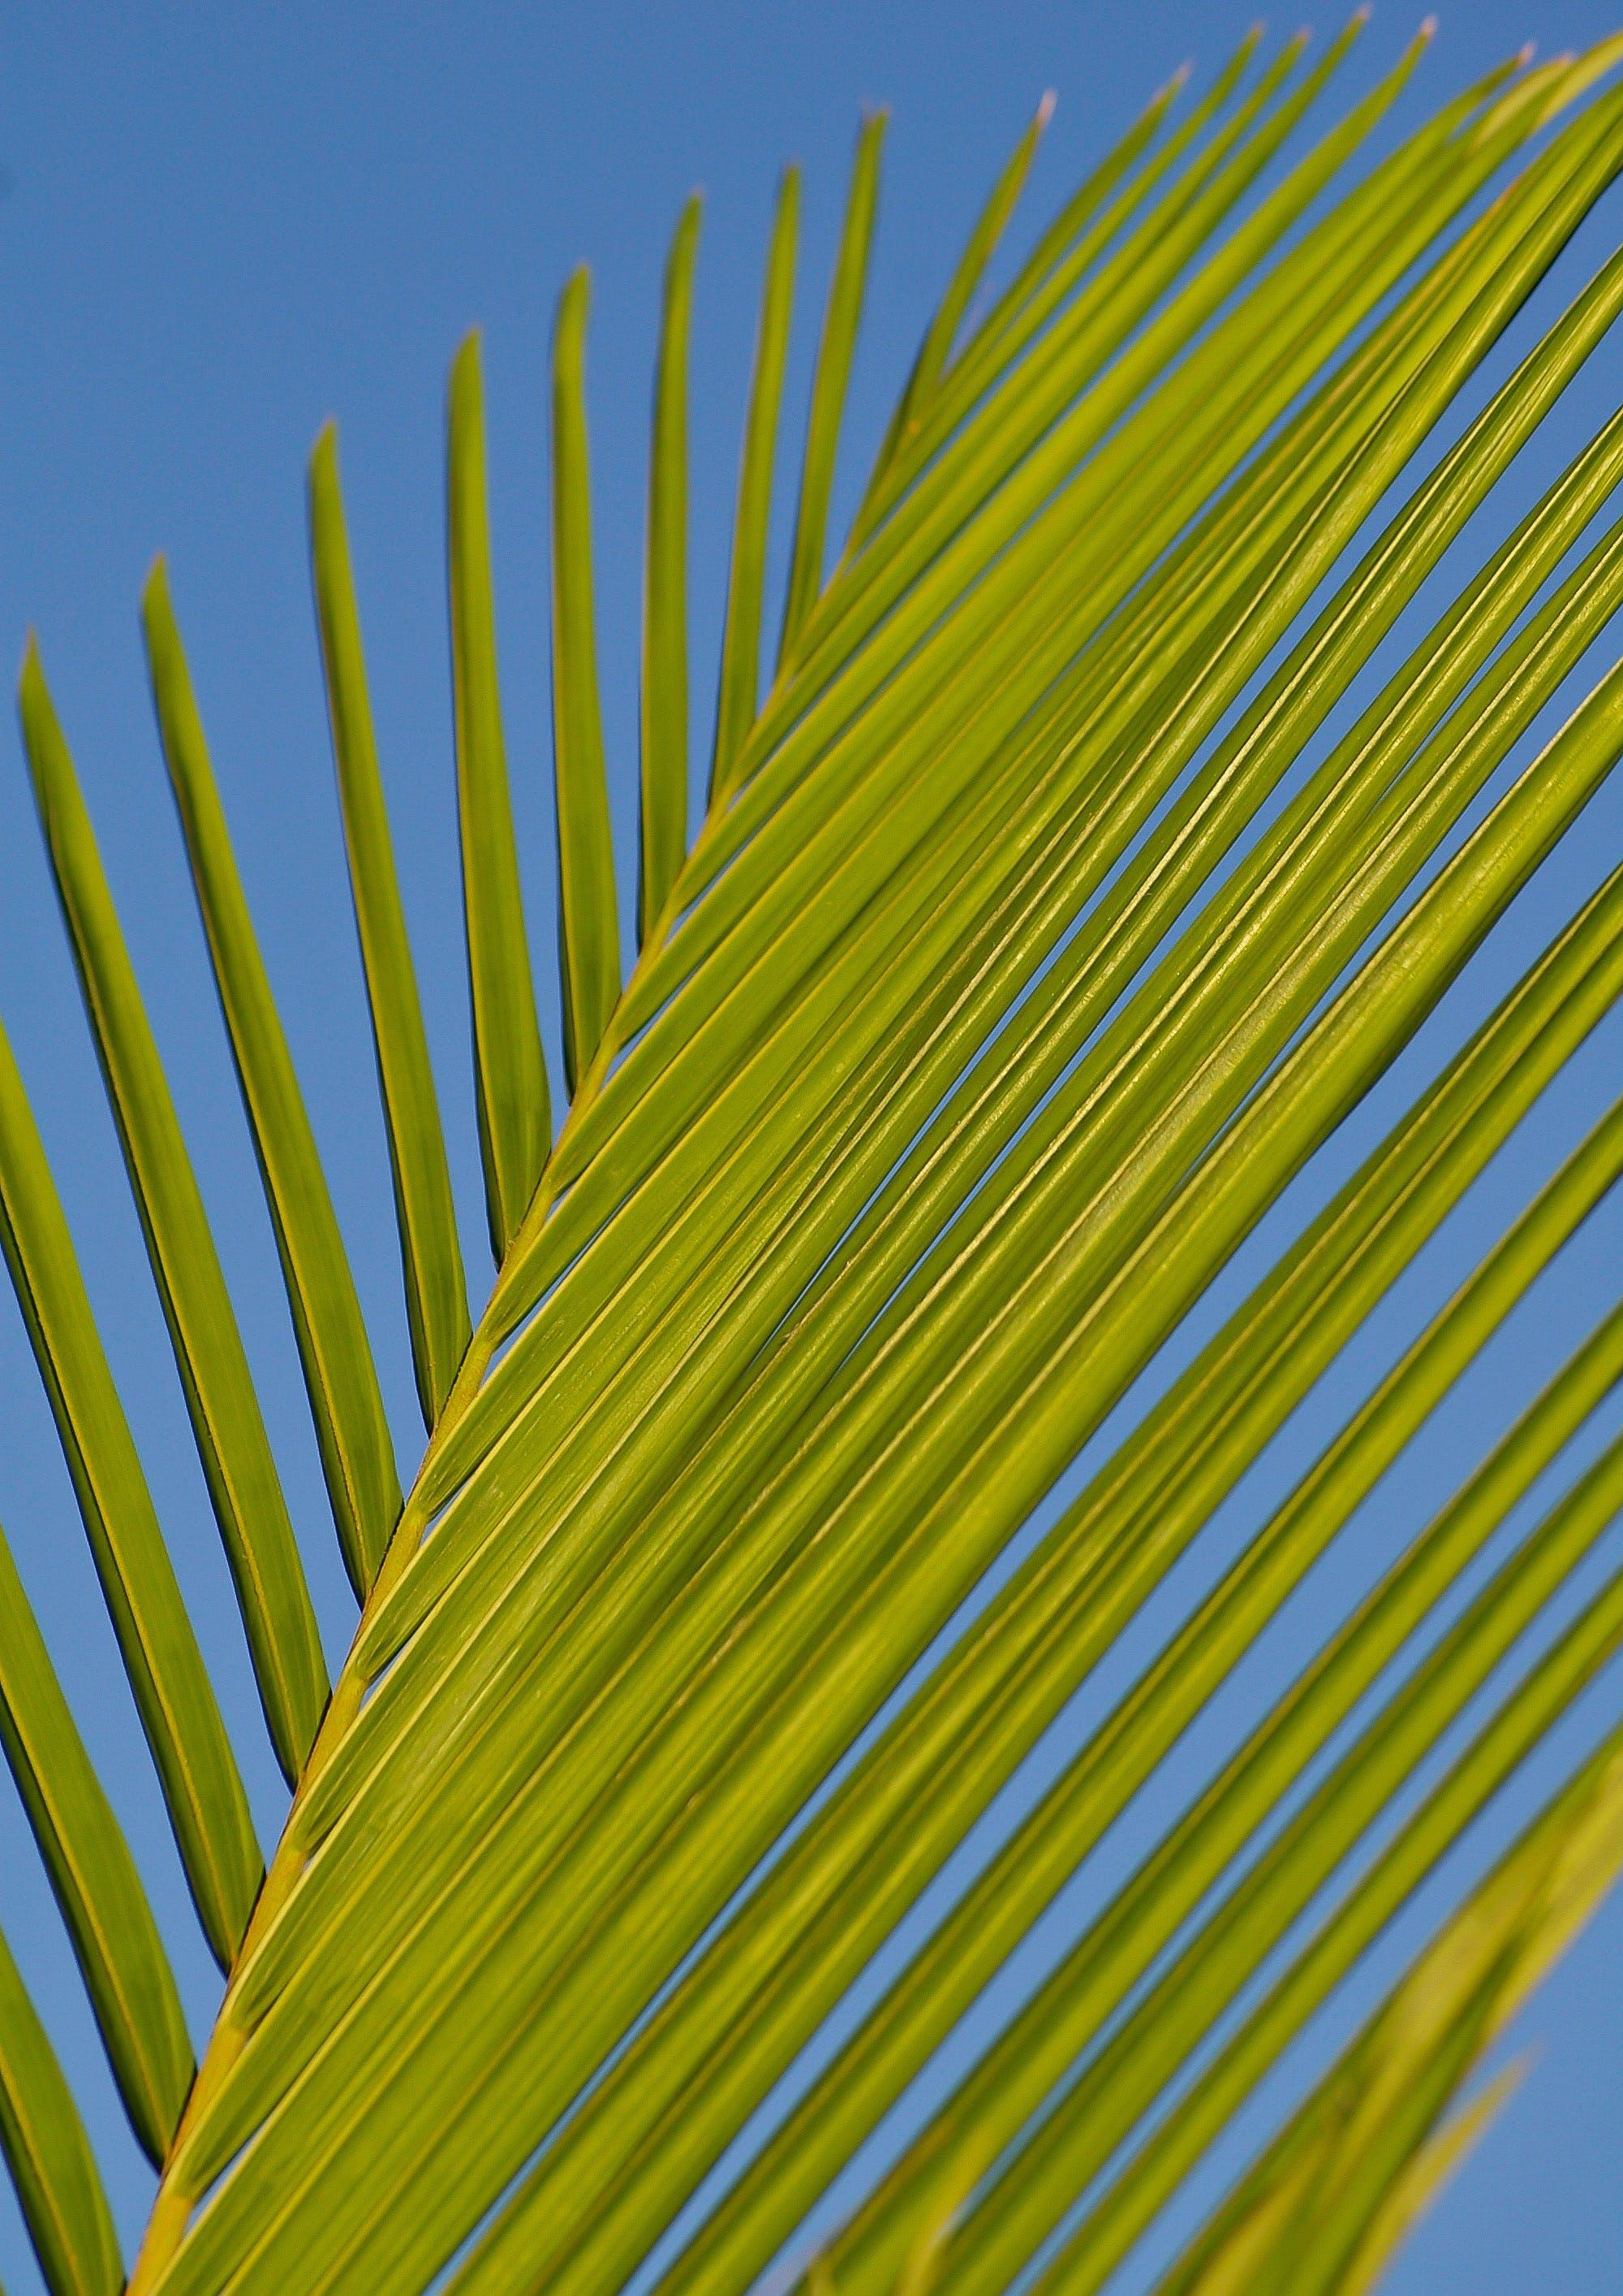 Green Palm Tree Branch during Daytime